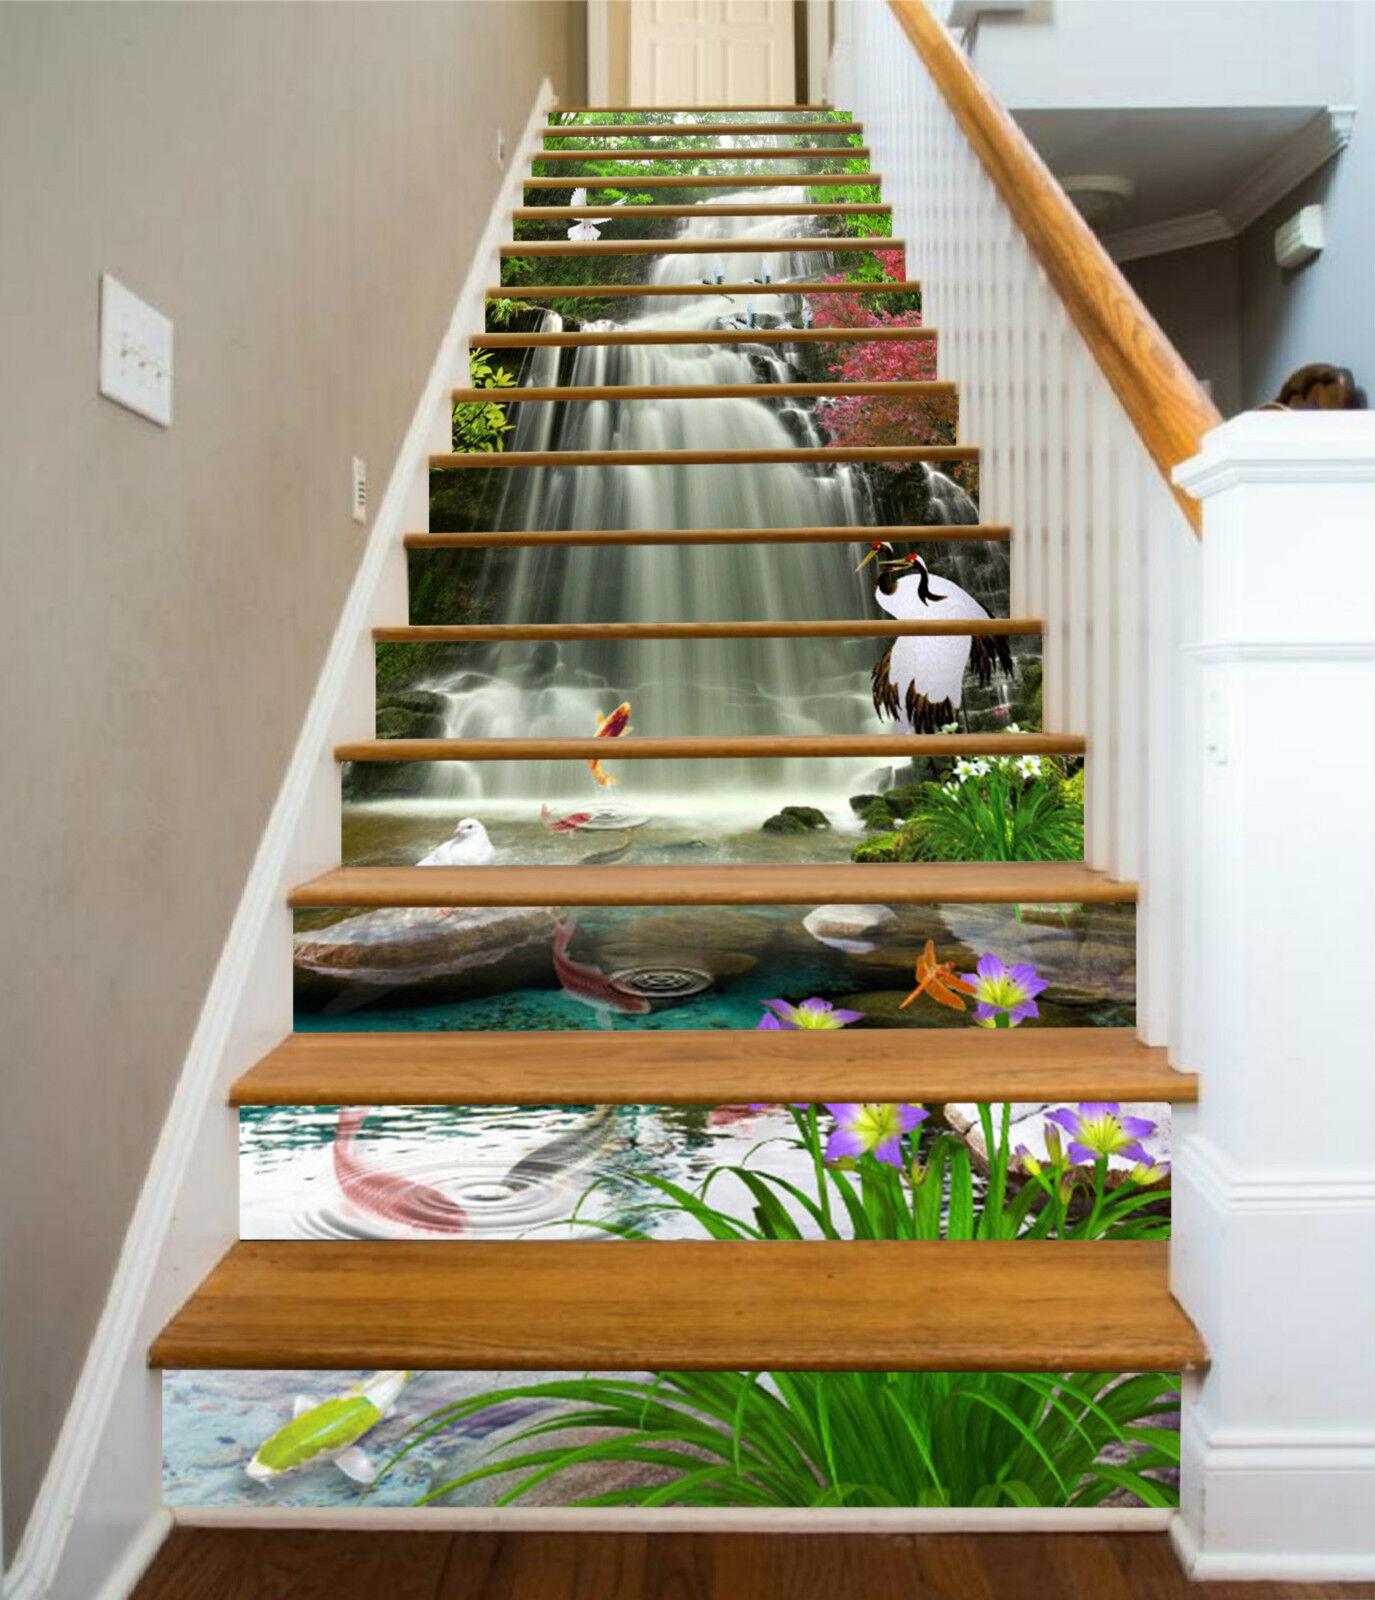 3d wasserfall 32 32 32 stair risers dekoration fototapete vinyl aufkleber tapete de 5082d6